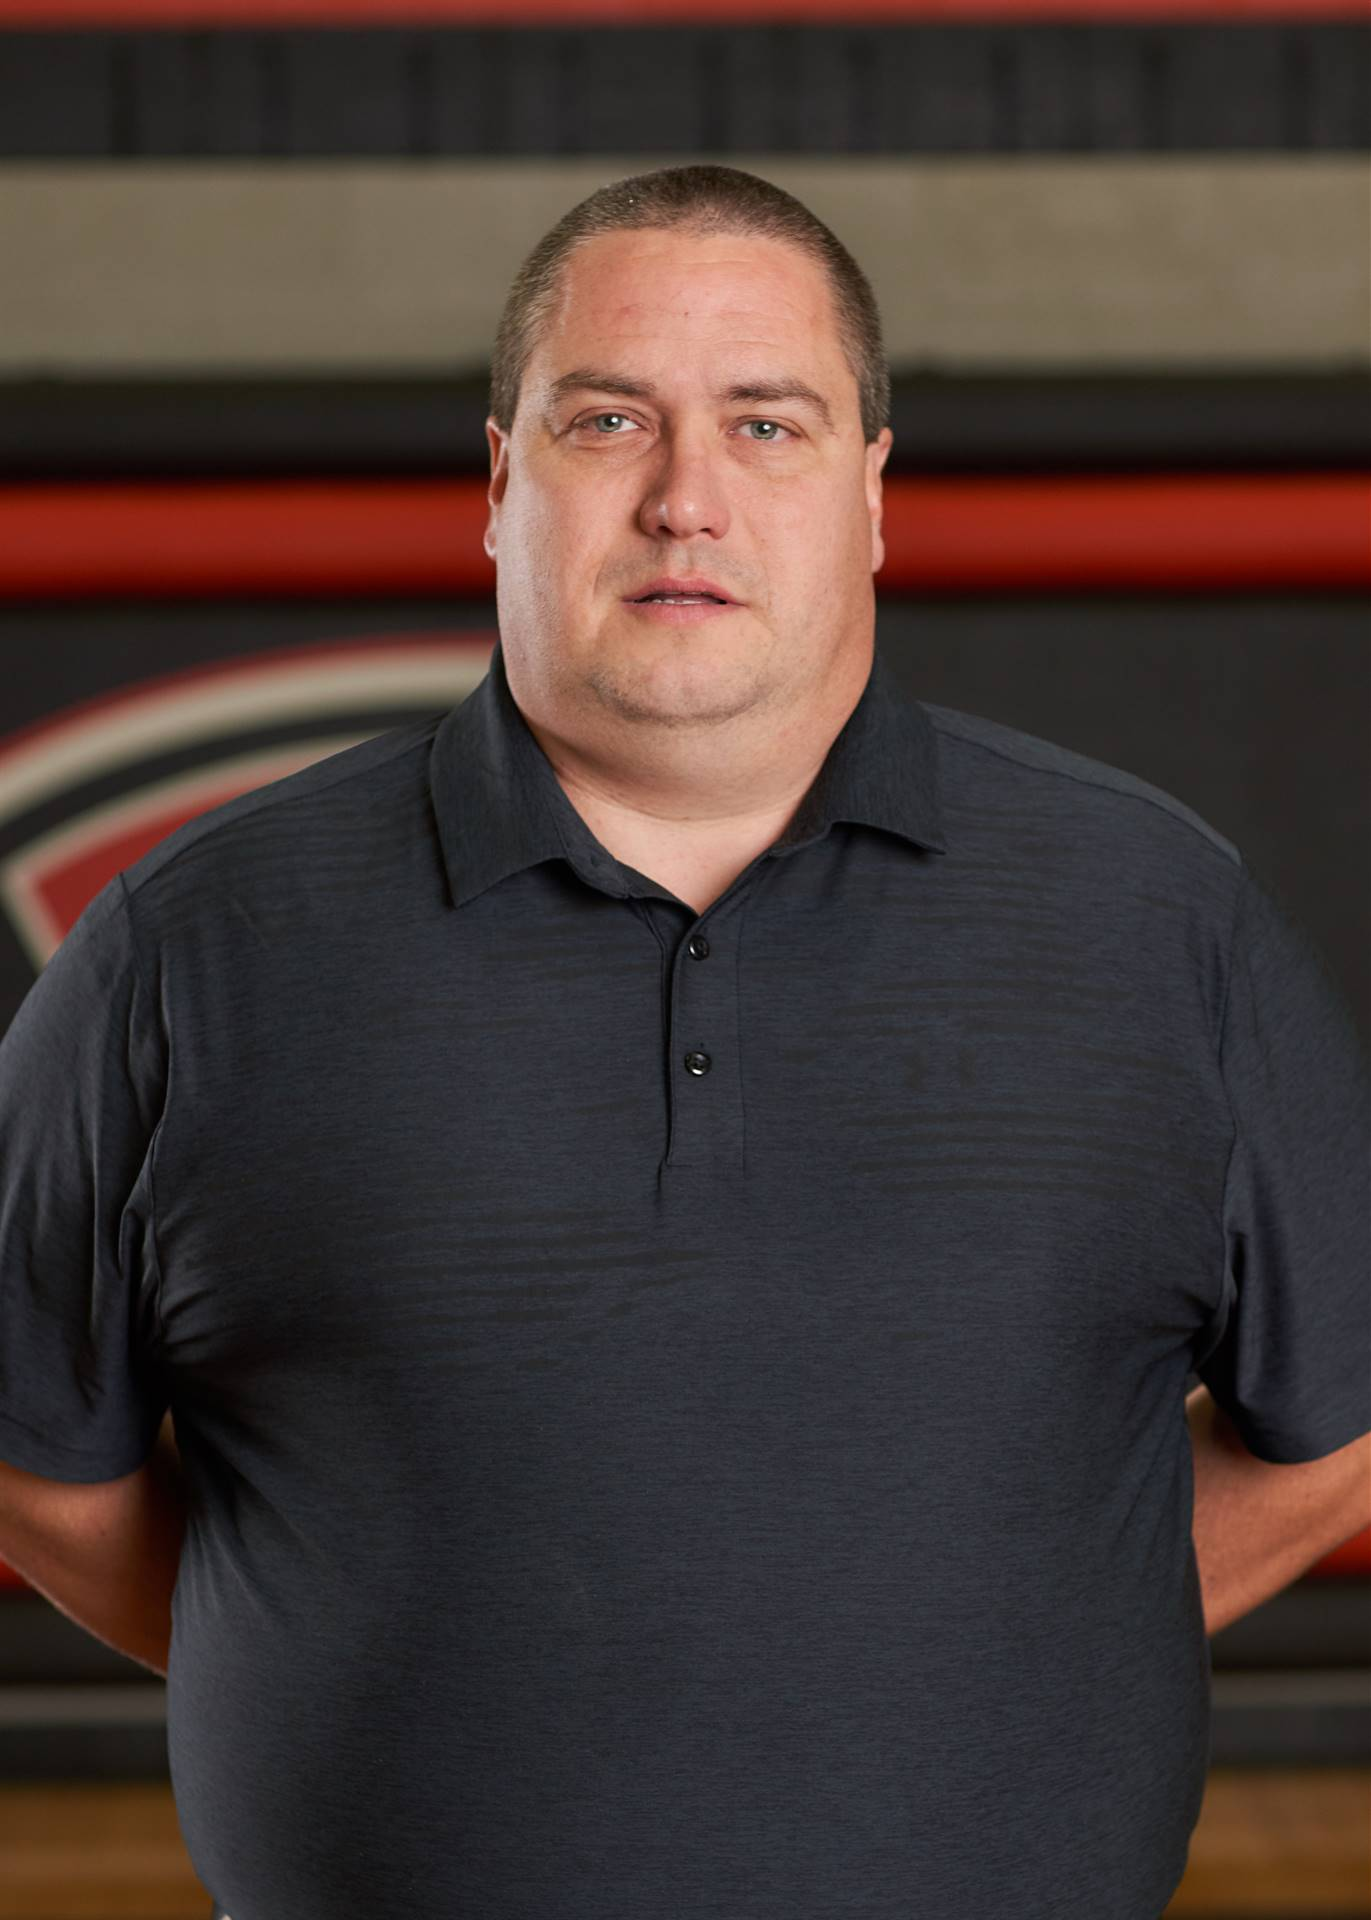 HS Girls Basketball Coach Lester McCurdy